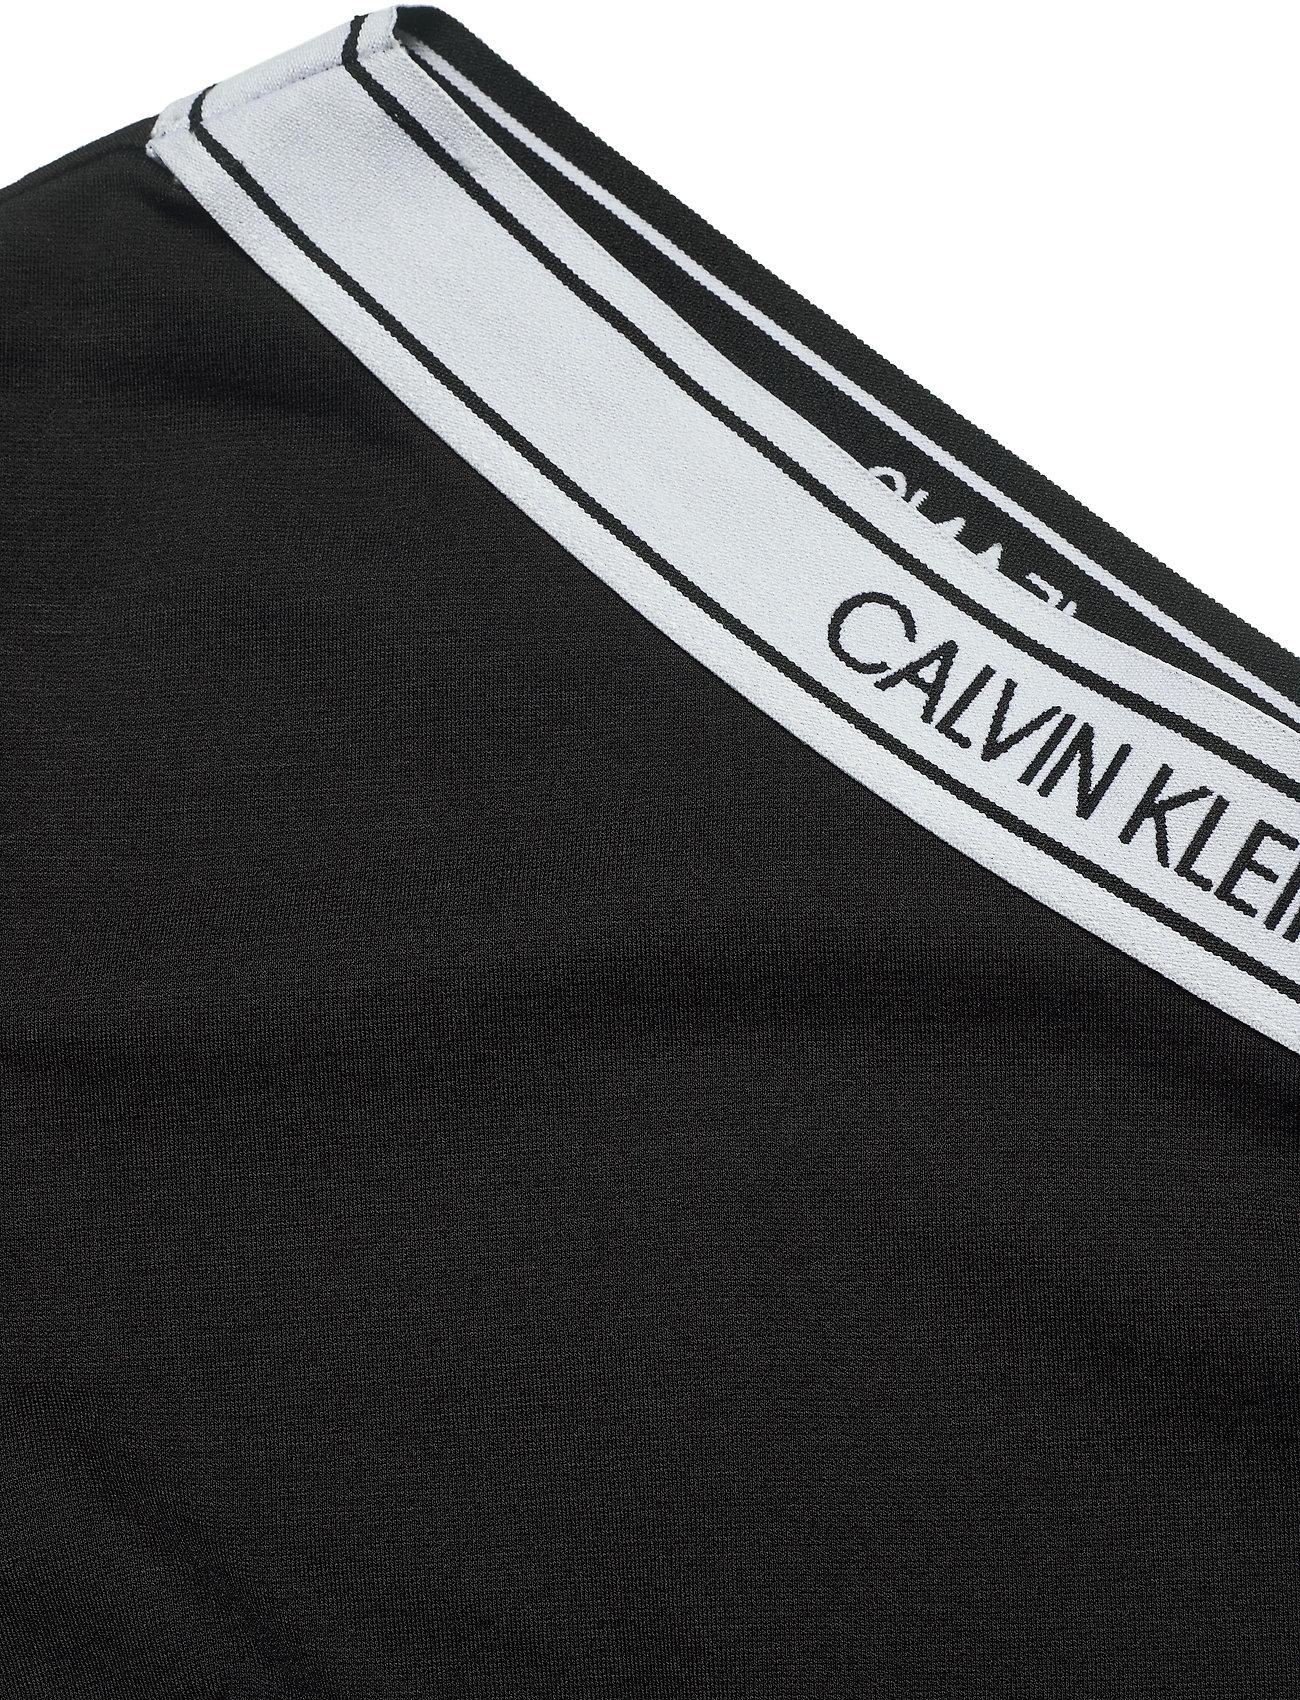 Asymm Milano Logo Fitted Dress (Ck Black) (1500 kr) - Calvin Klein Jeans